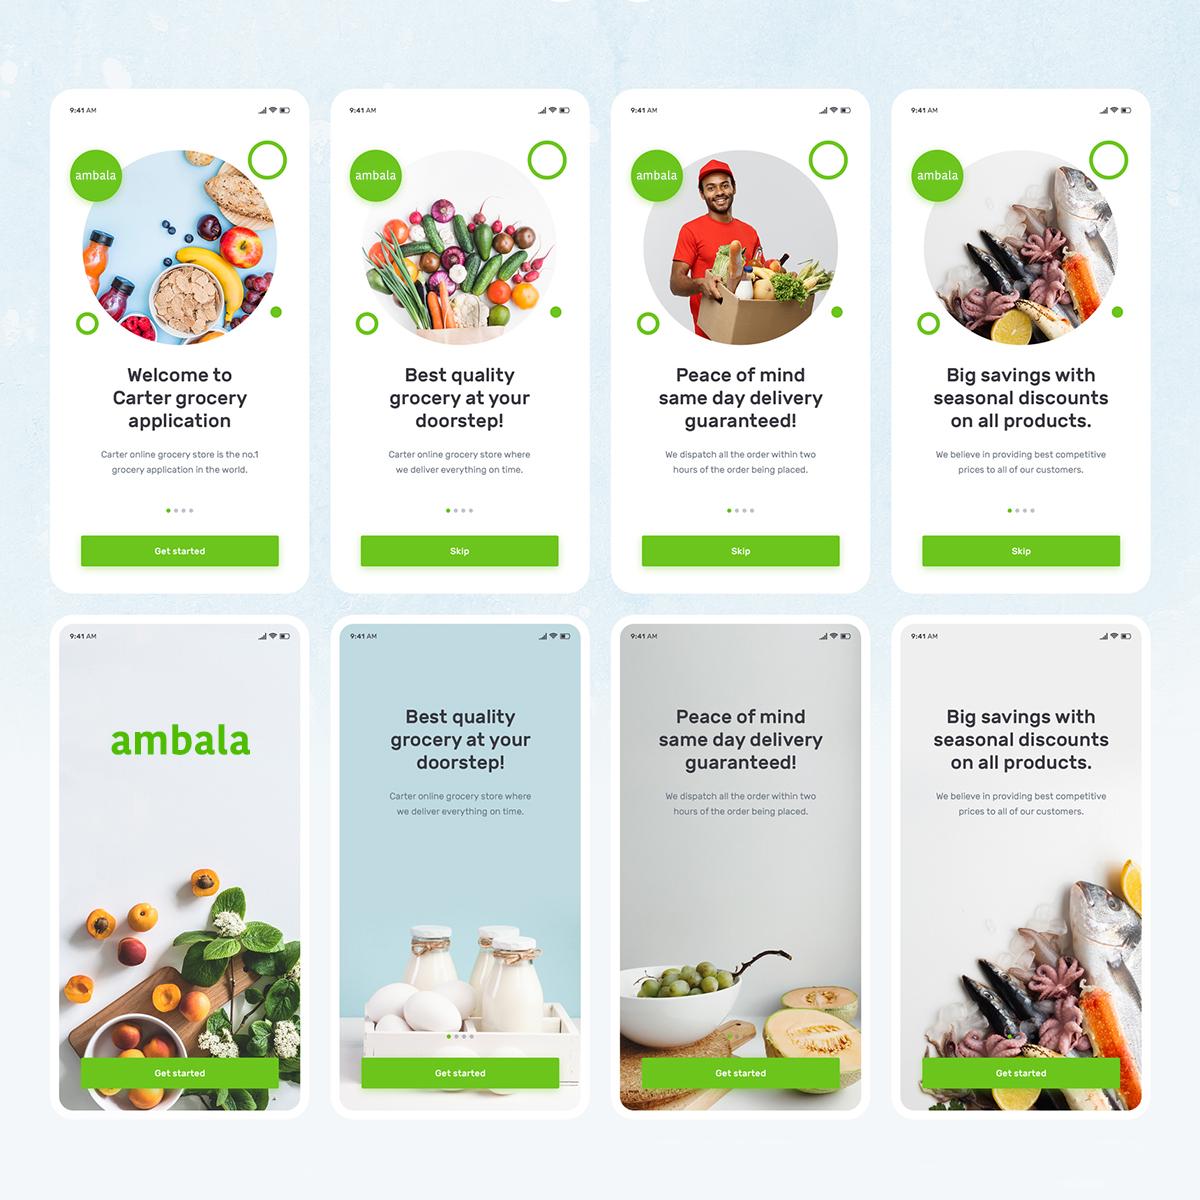 Our On going Grocery Shop Mobile App UI/UX design concept.  Stay in touch: http://www.appbuff.net  #uiux #startup #business #iosdeveloper #mobileappdevelopment #appdeveloper #appdevelopment #appdesign #appdesigner #flutter #uxdesign #uxdesigner #javascript #designerpic.twitter.com/3KZHAziJxg